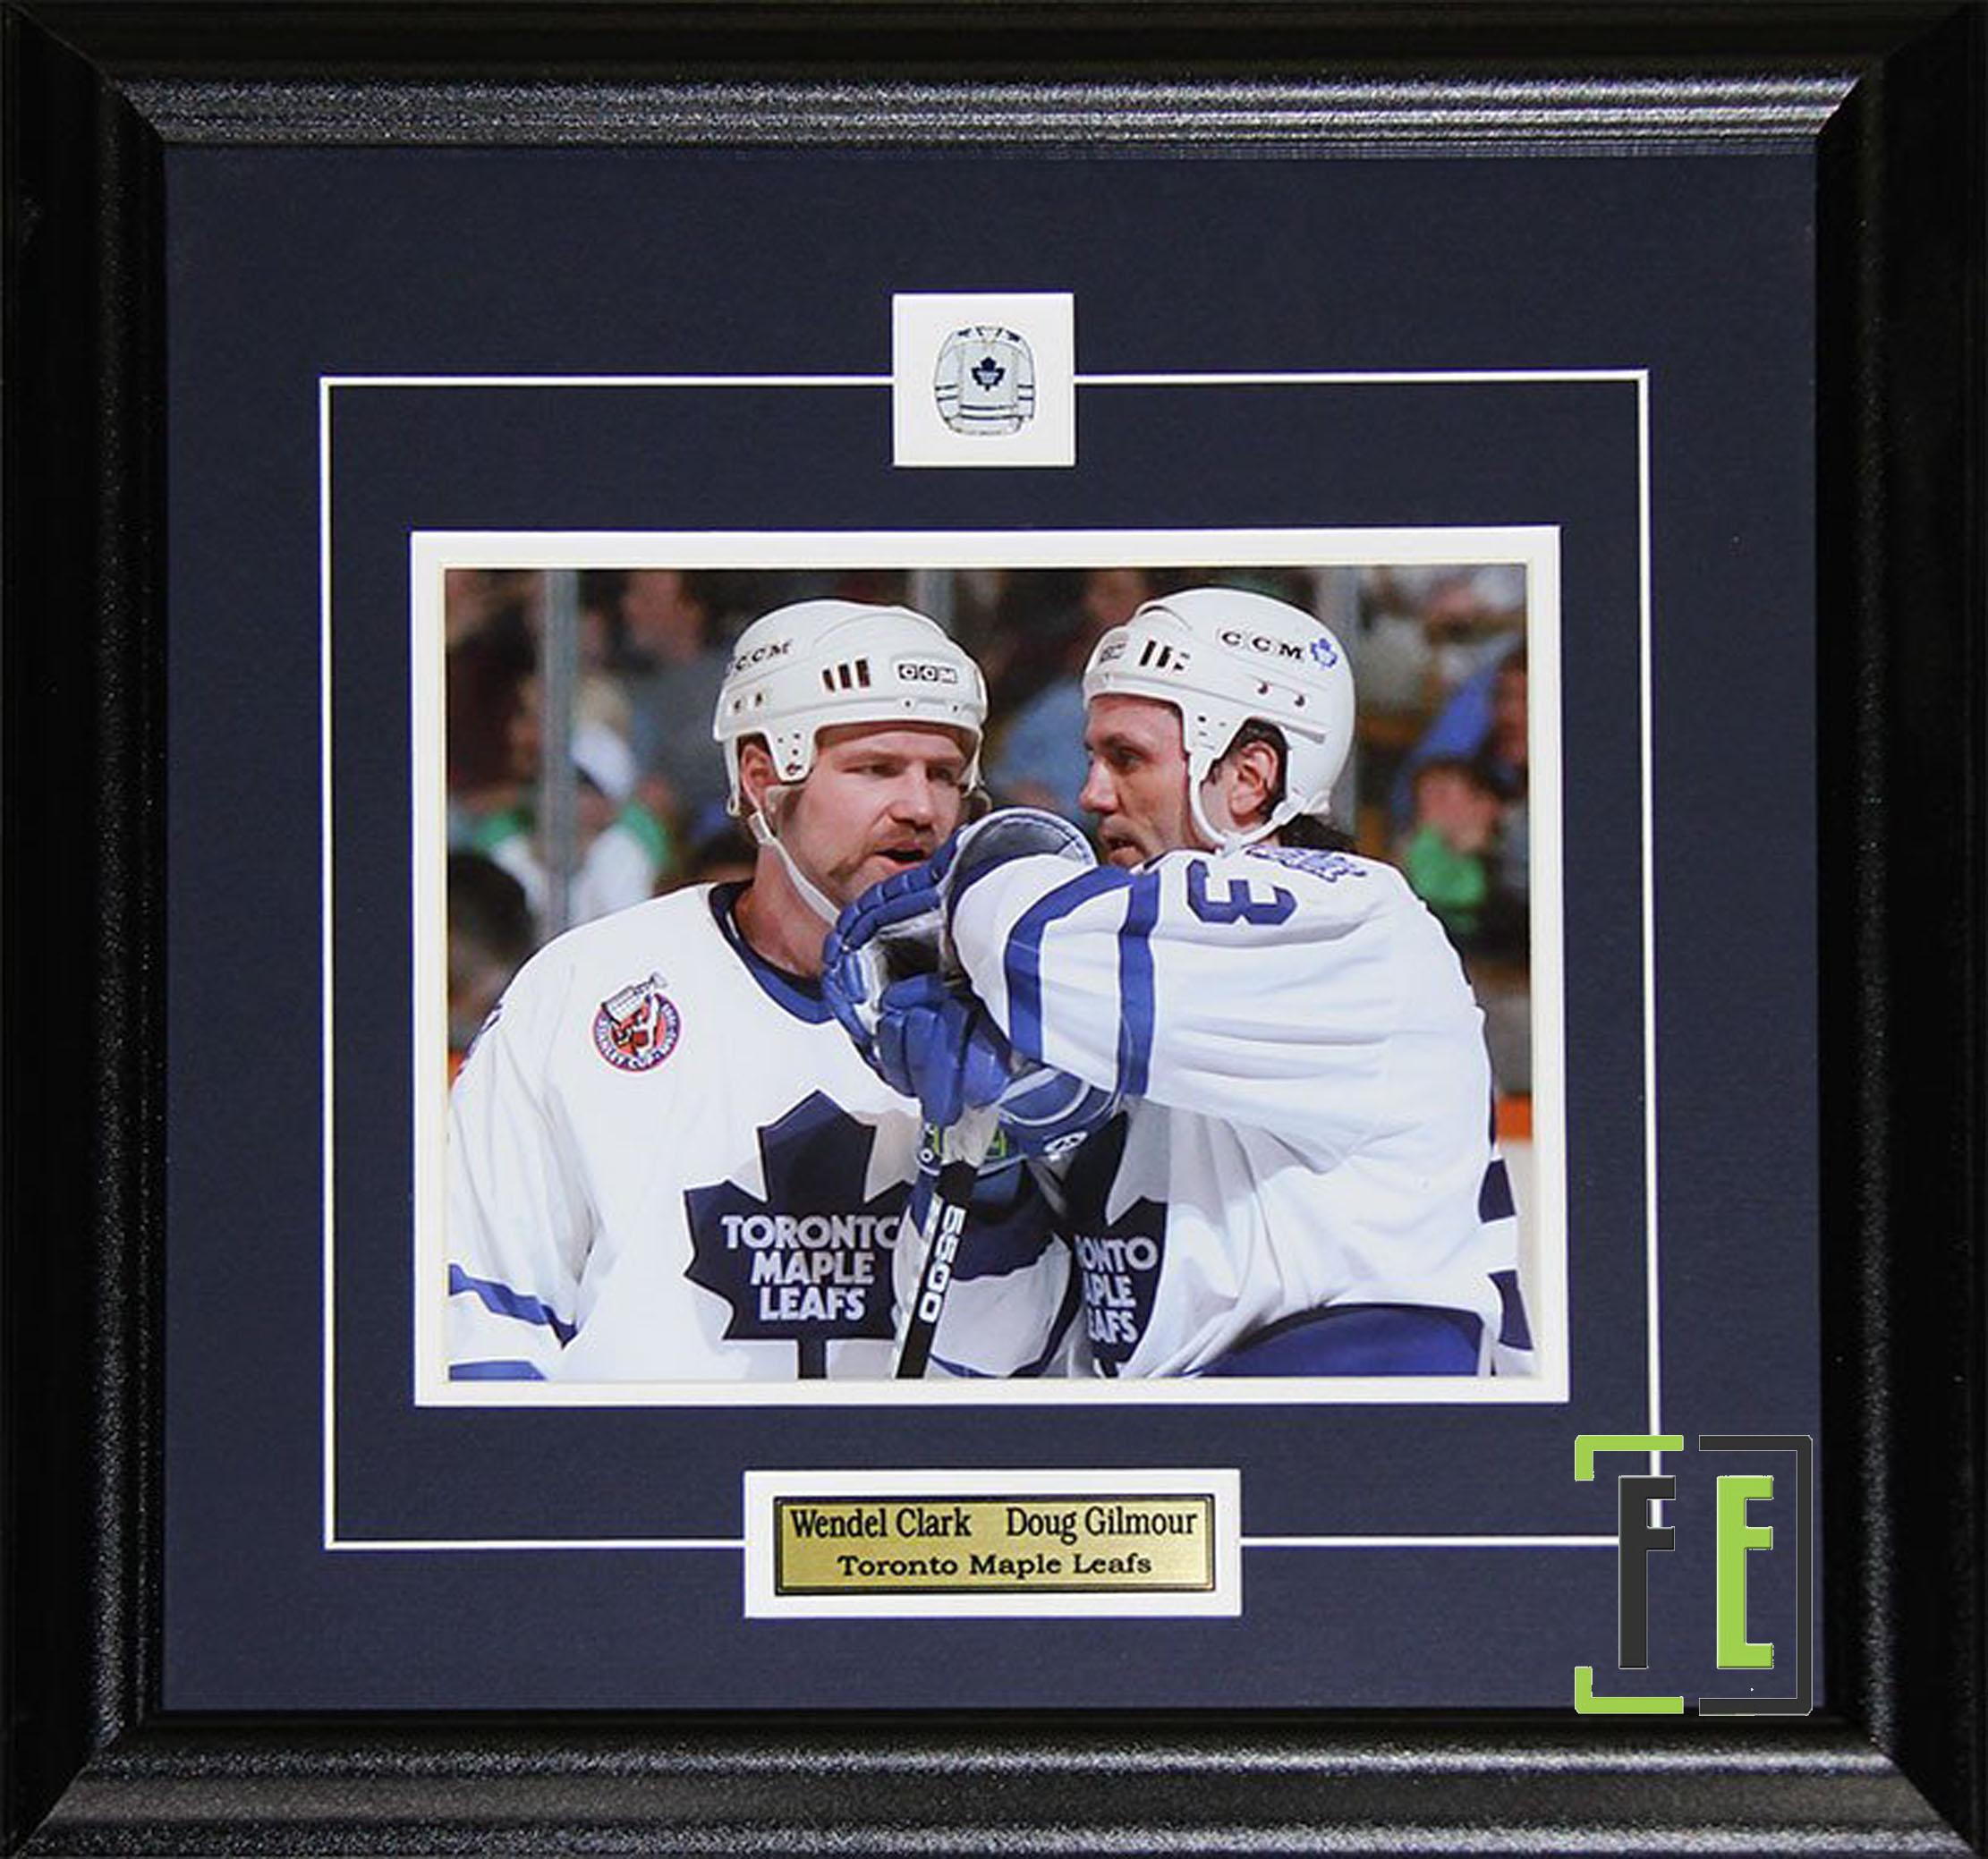 wholesale dealer 3c28c 843ec Wendel Clark & Doug Gilmour Toronto Maple Leafs 8x10 Photograph Framed